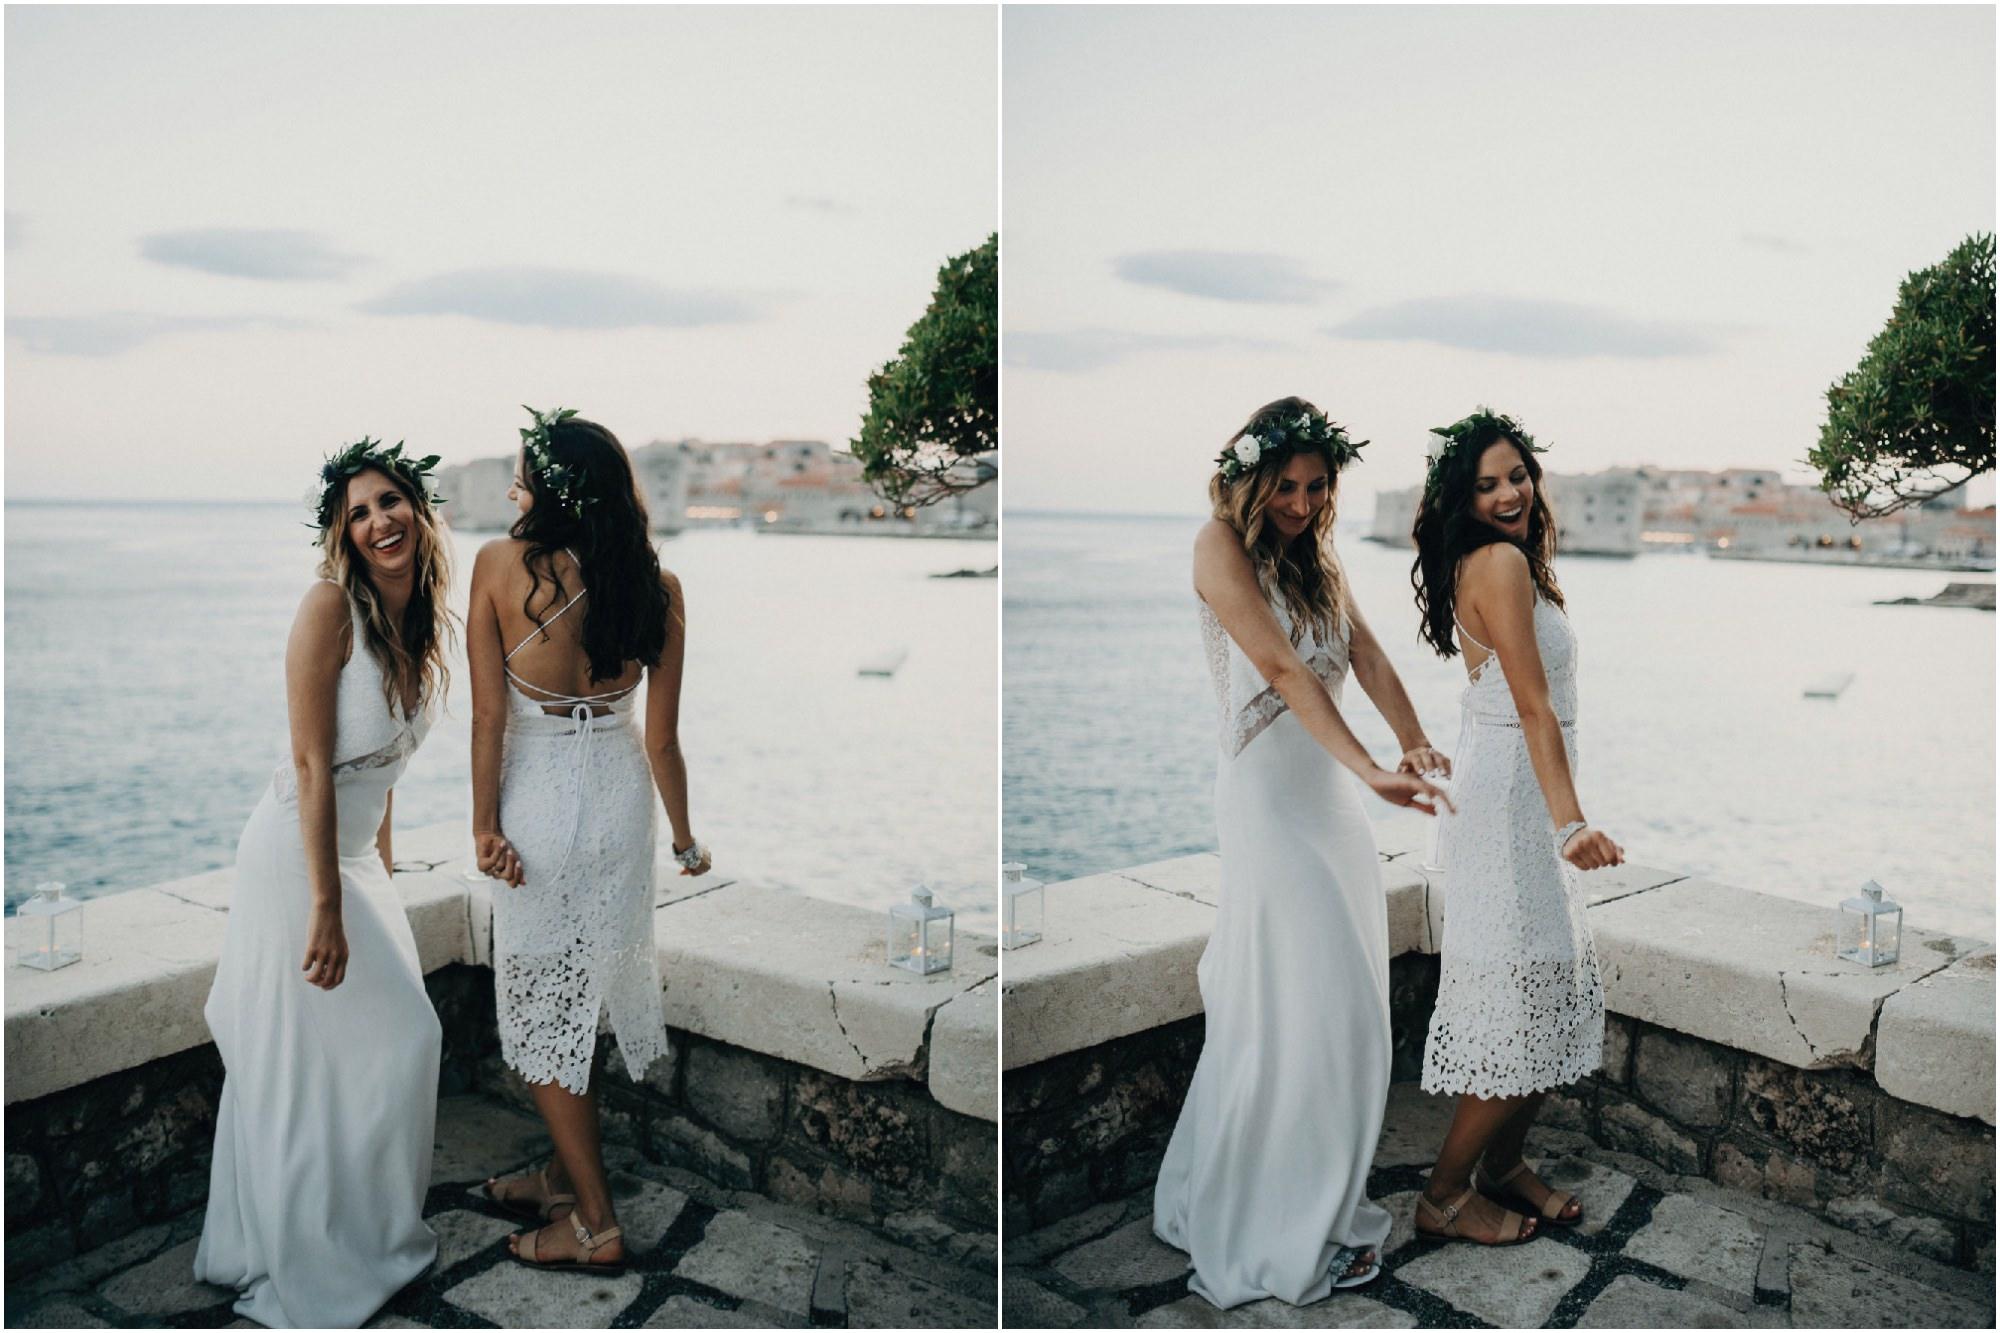 dubrovnik_croatia_wedding_photographer-jere_satamo-destination_weddings-064-web.jpg